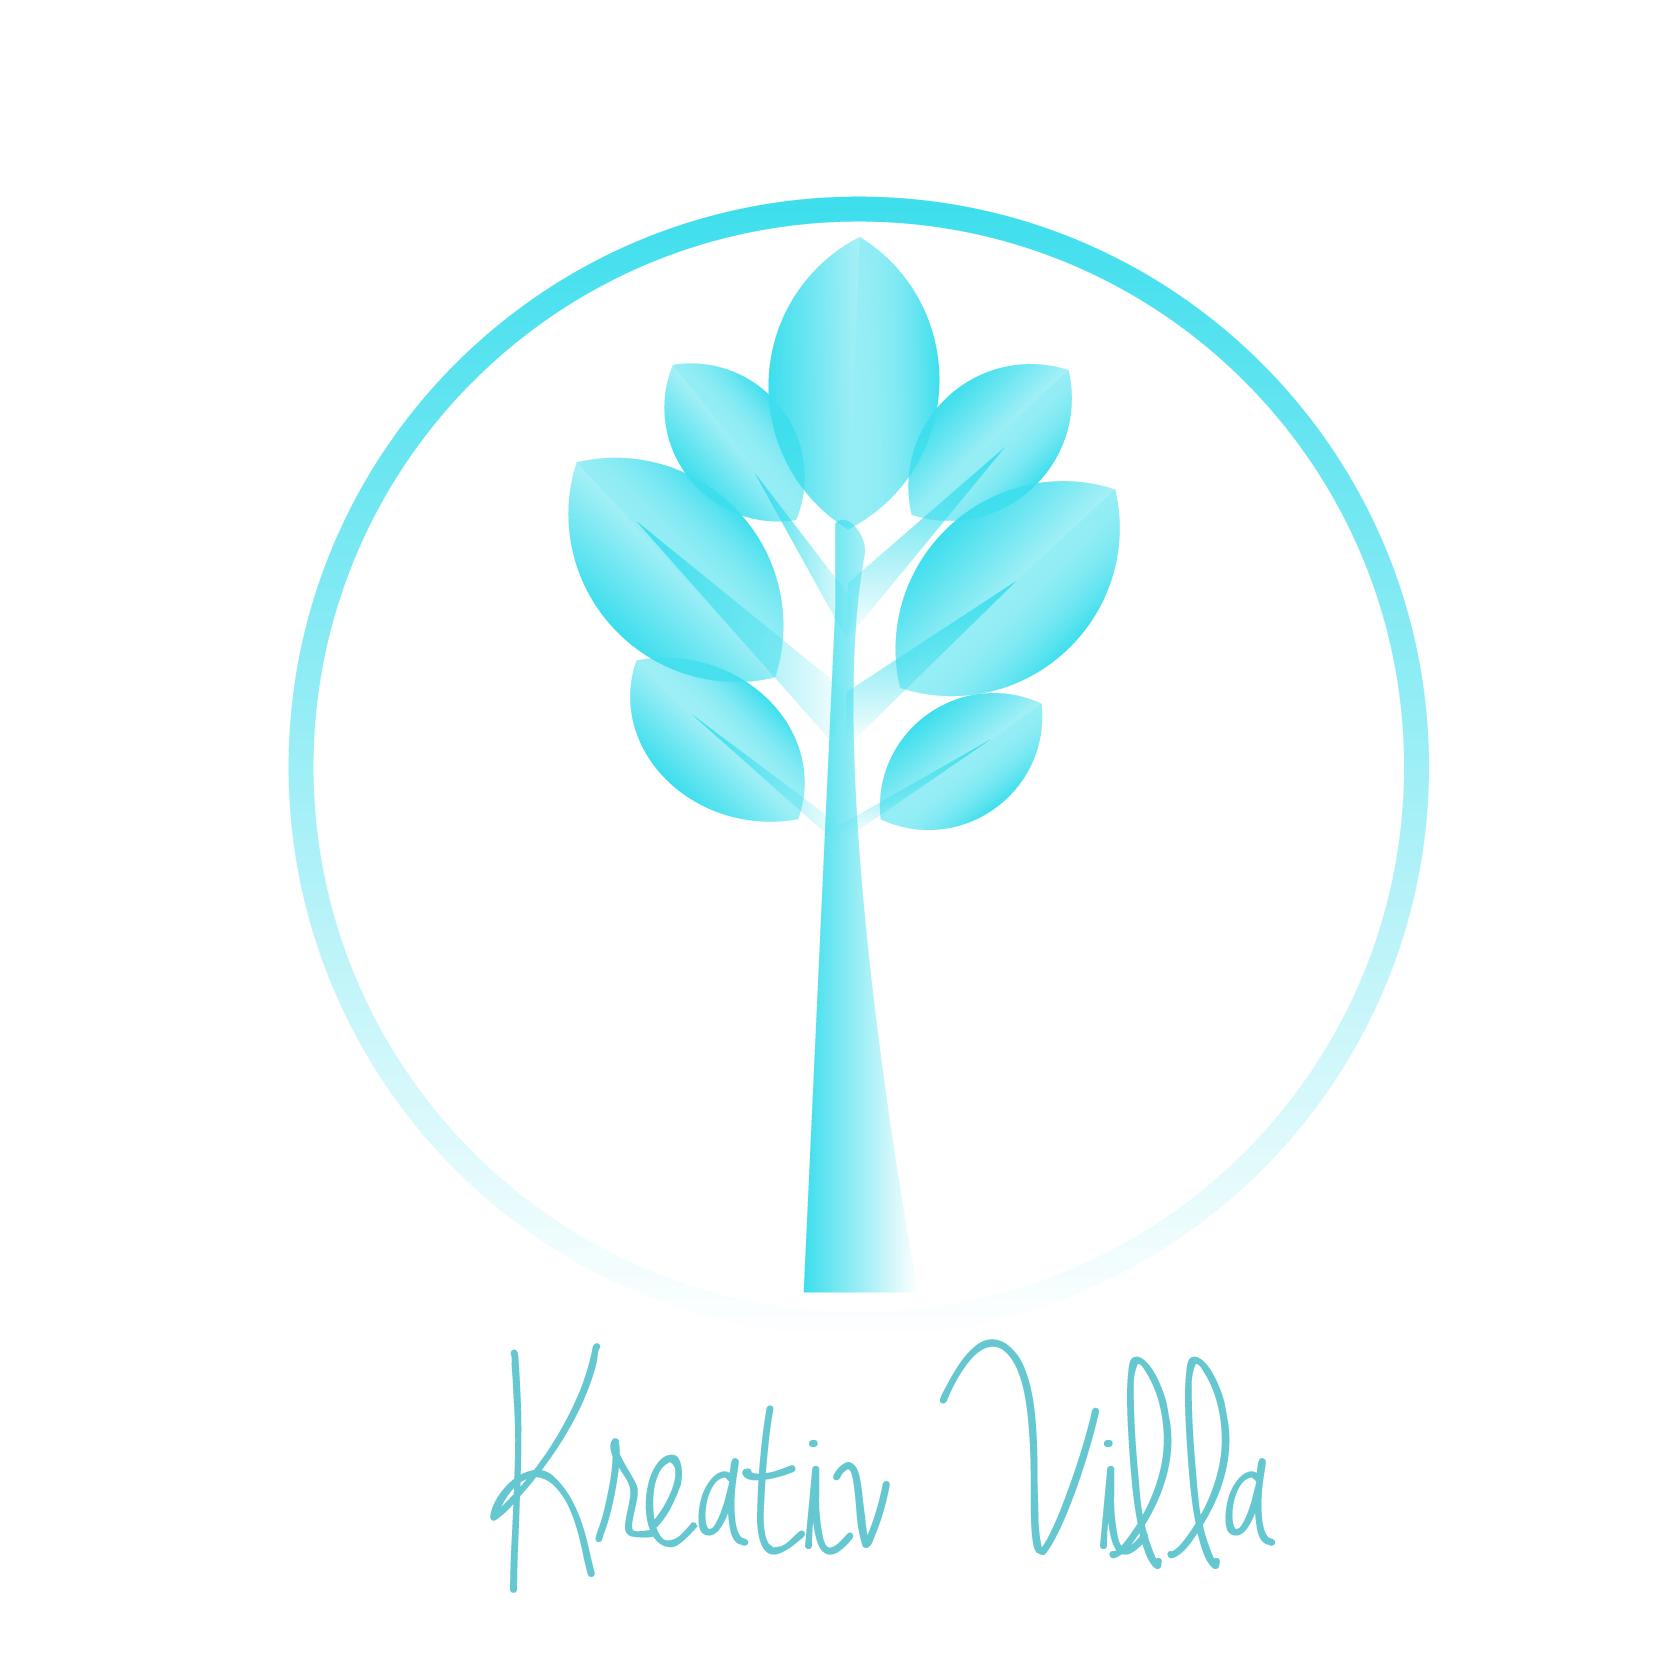 logo design kreativ villa oberkassel das mechanische auge düsseldorf